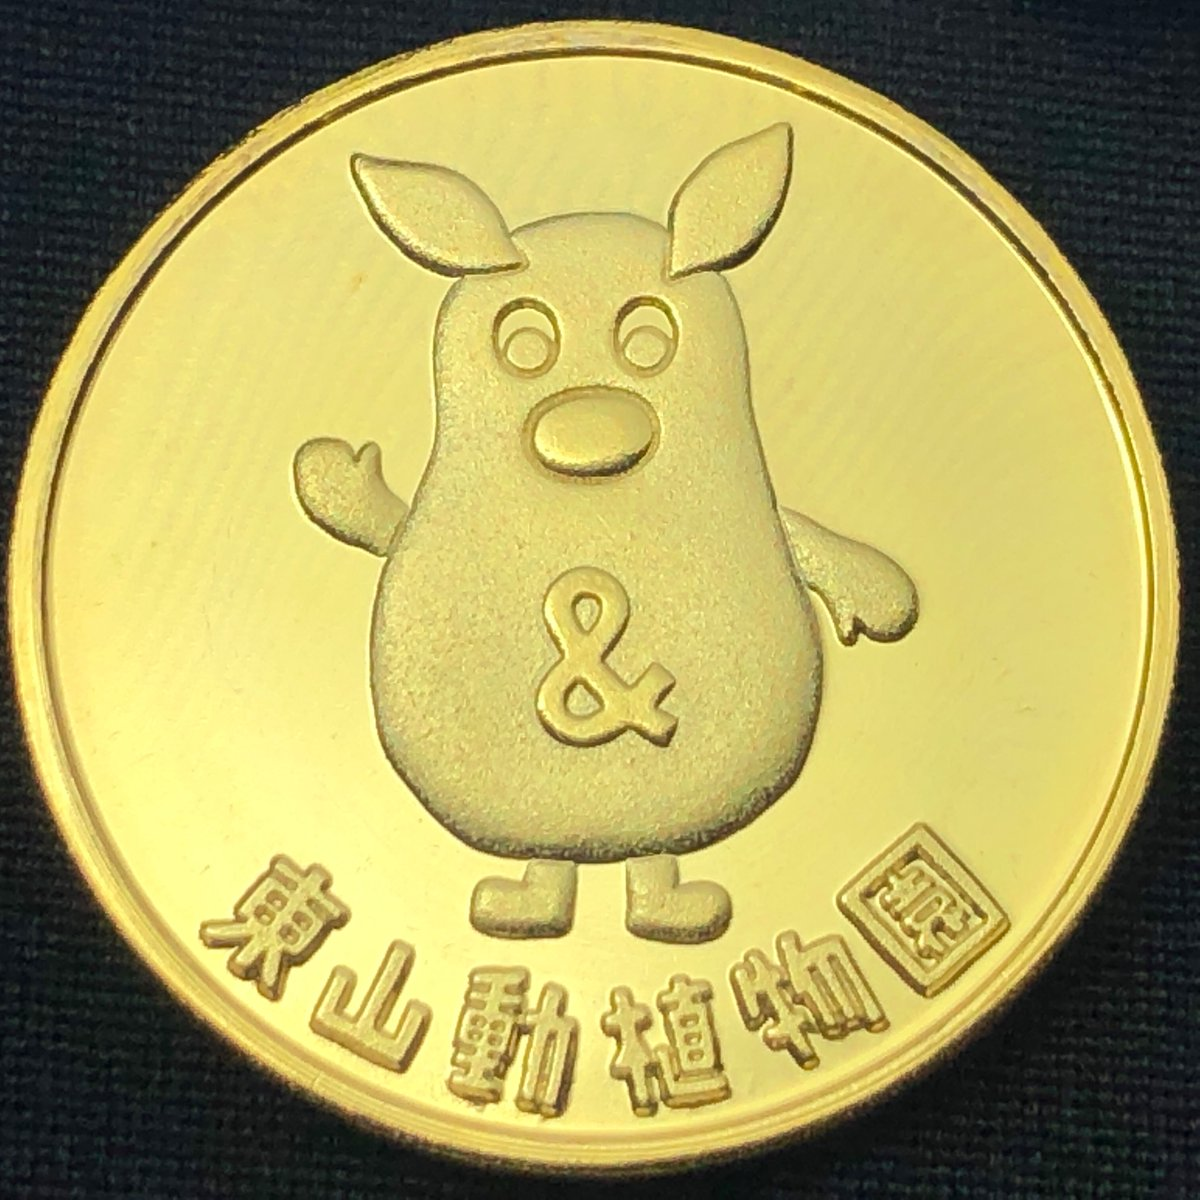 test ツイッターメディア - 東山動植物園の記念メダル(ズーボ)。 https://t.co/4jFVASfySf